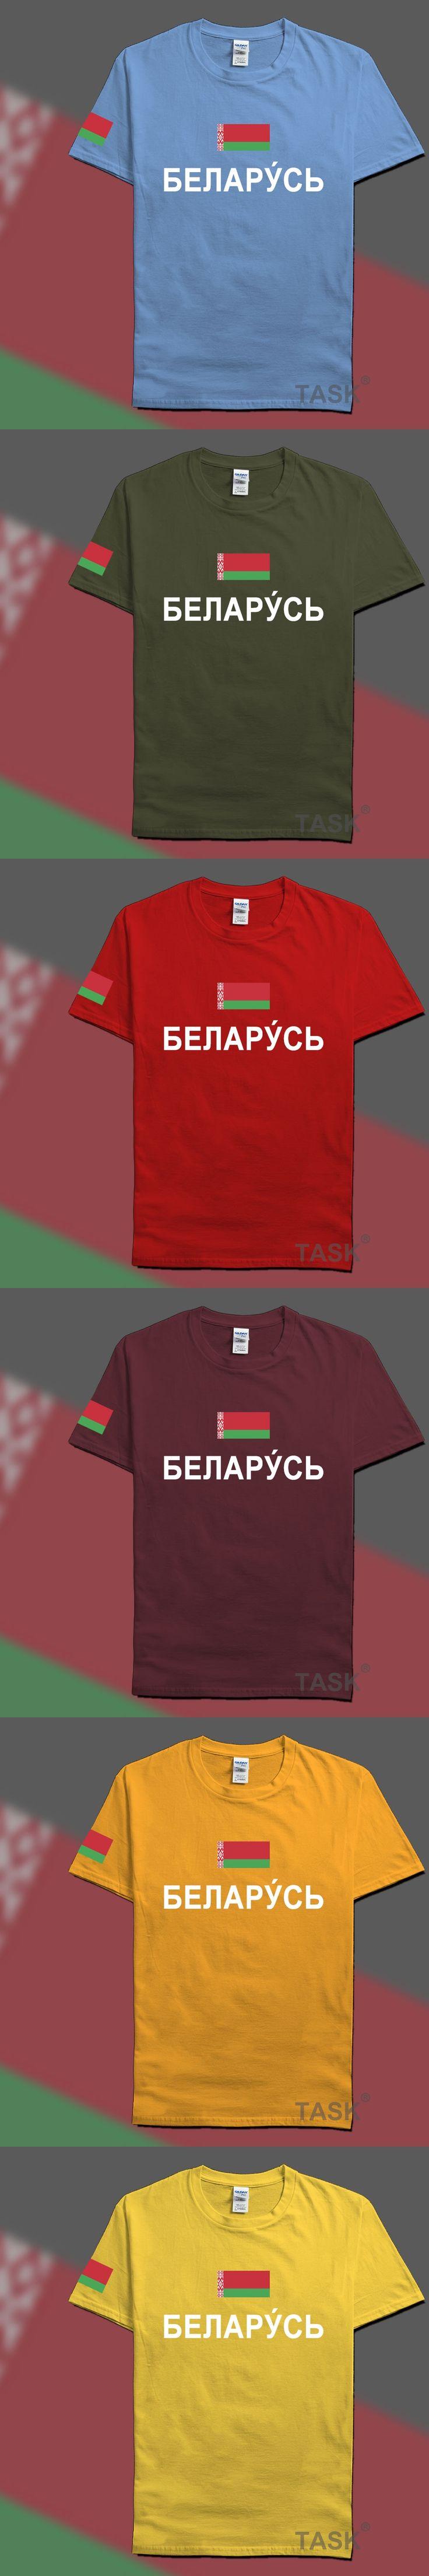 Republic of Belarus Belarusian mens t shirts fashion 2017 jerseys' nation 100% cotton t-shirt clothing tees country sporting BLR